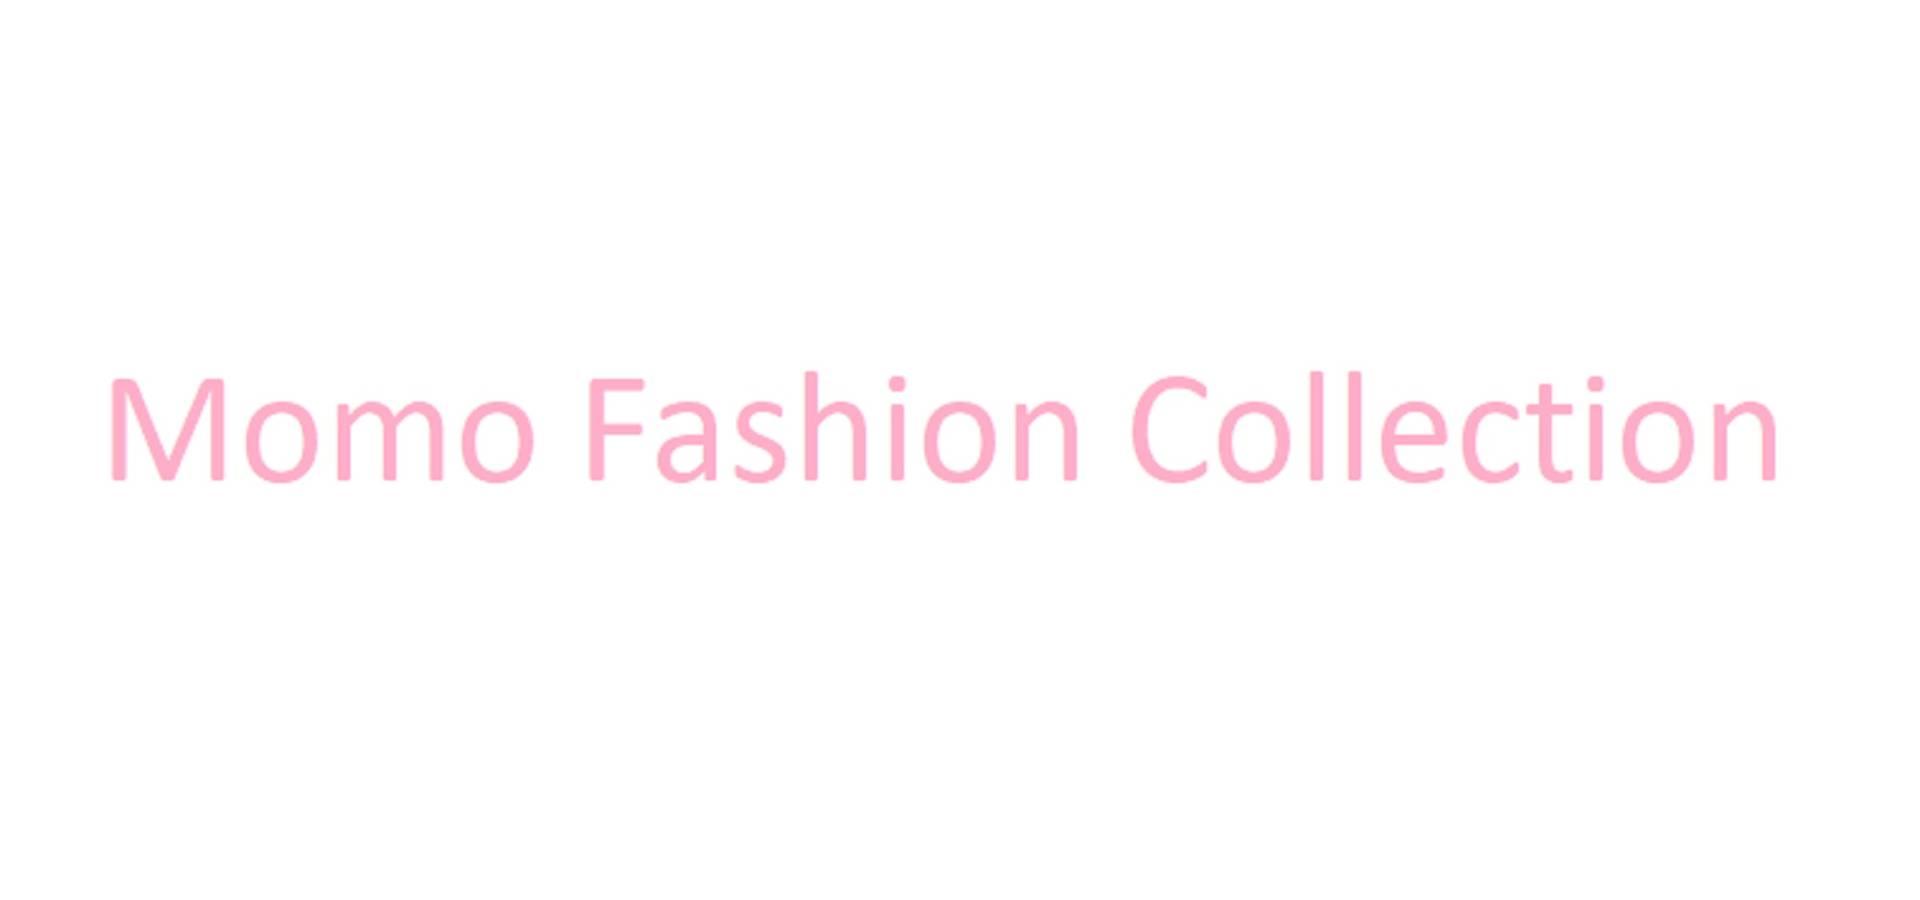 Momo Fashion Collection